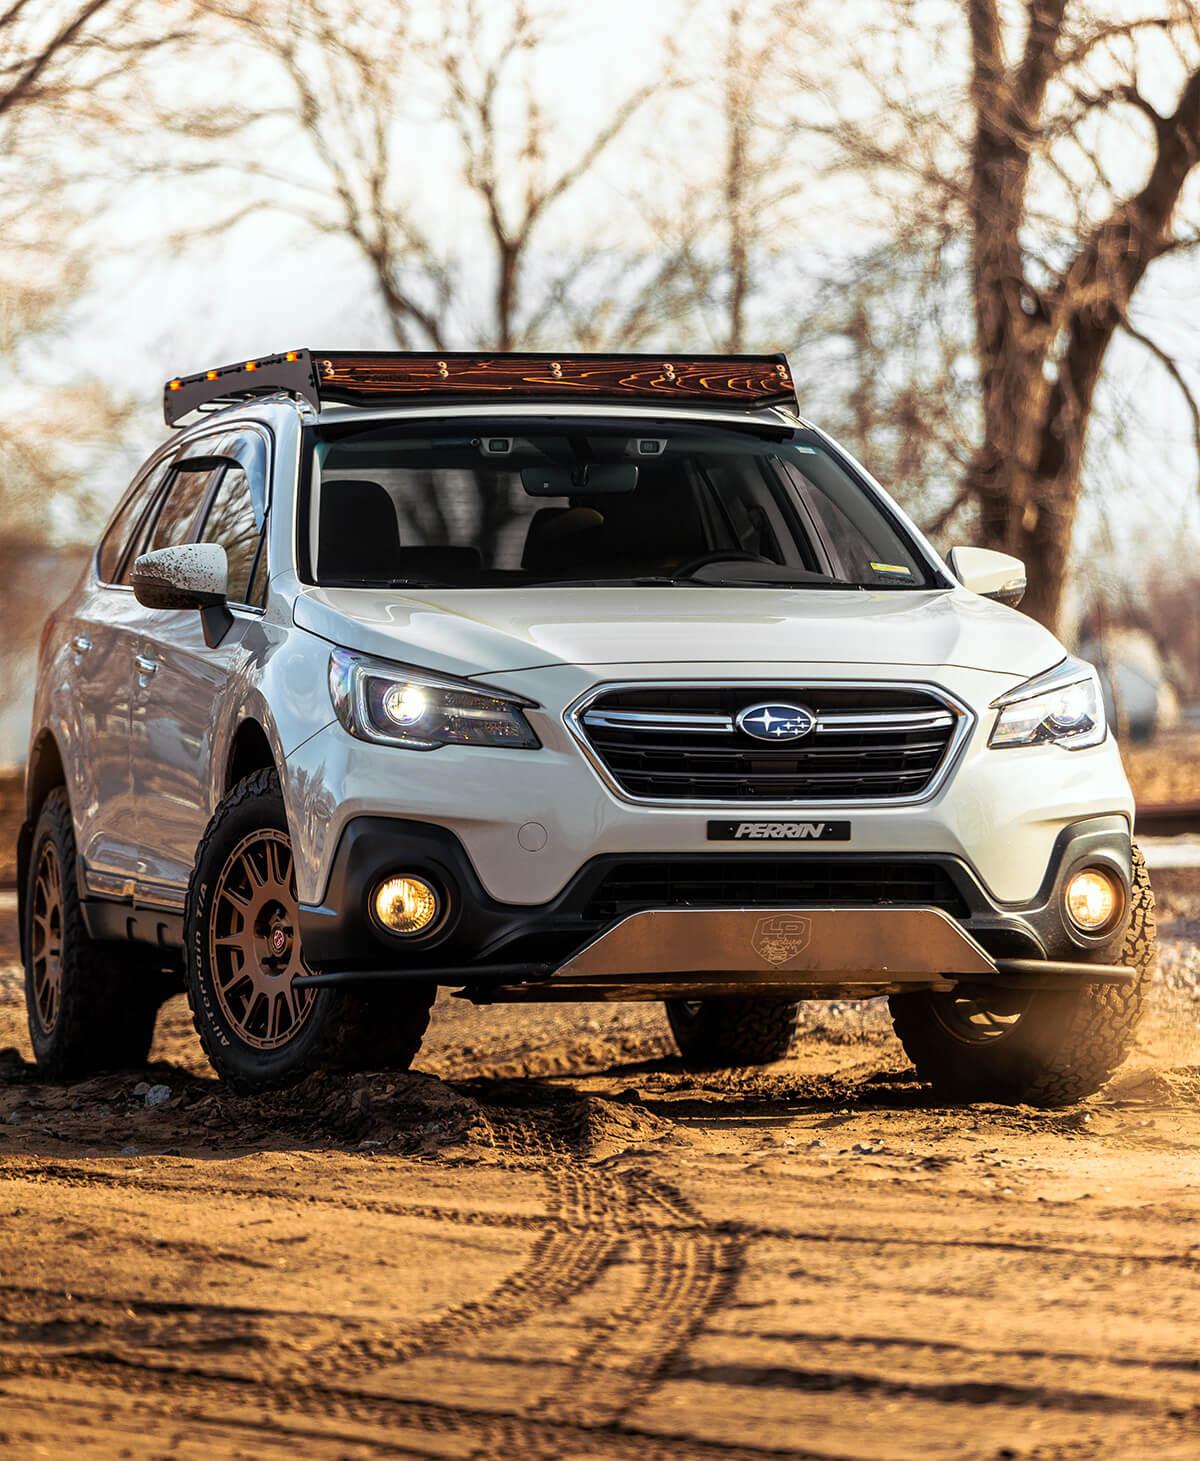 Subaru Pickup 2019 : subaru, pickup, Lifted, Subaru, Outback, Overland-Style, Upgrades